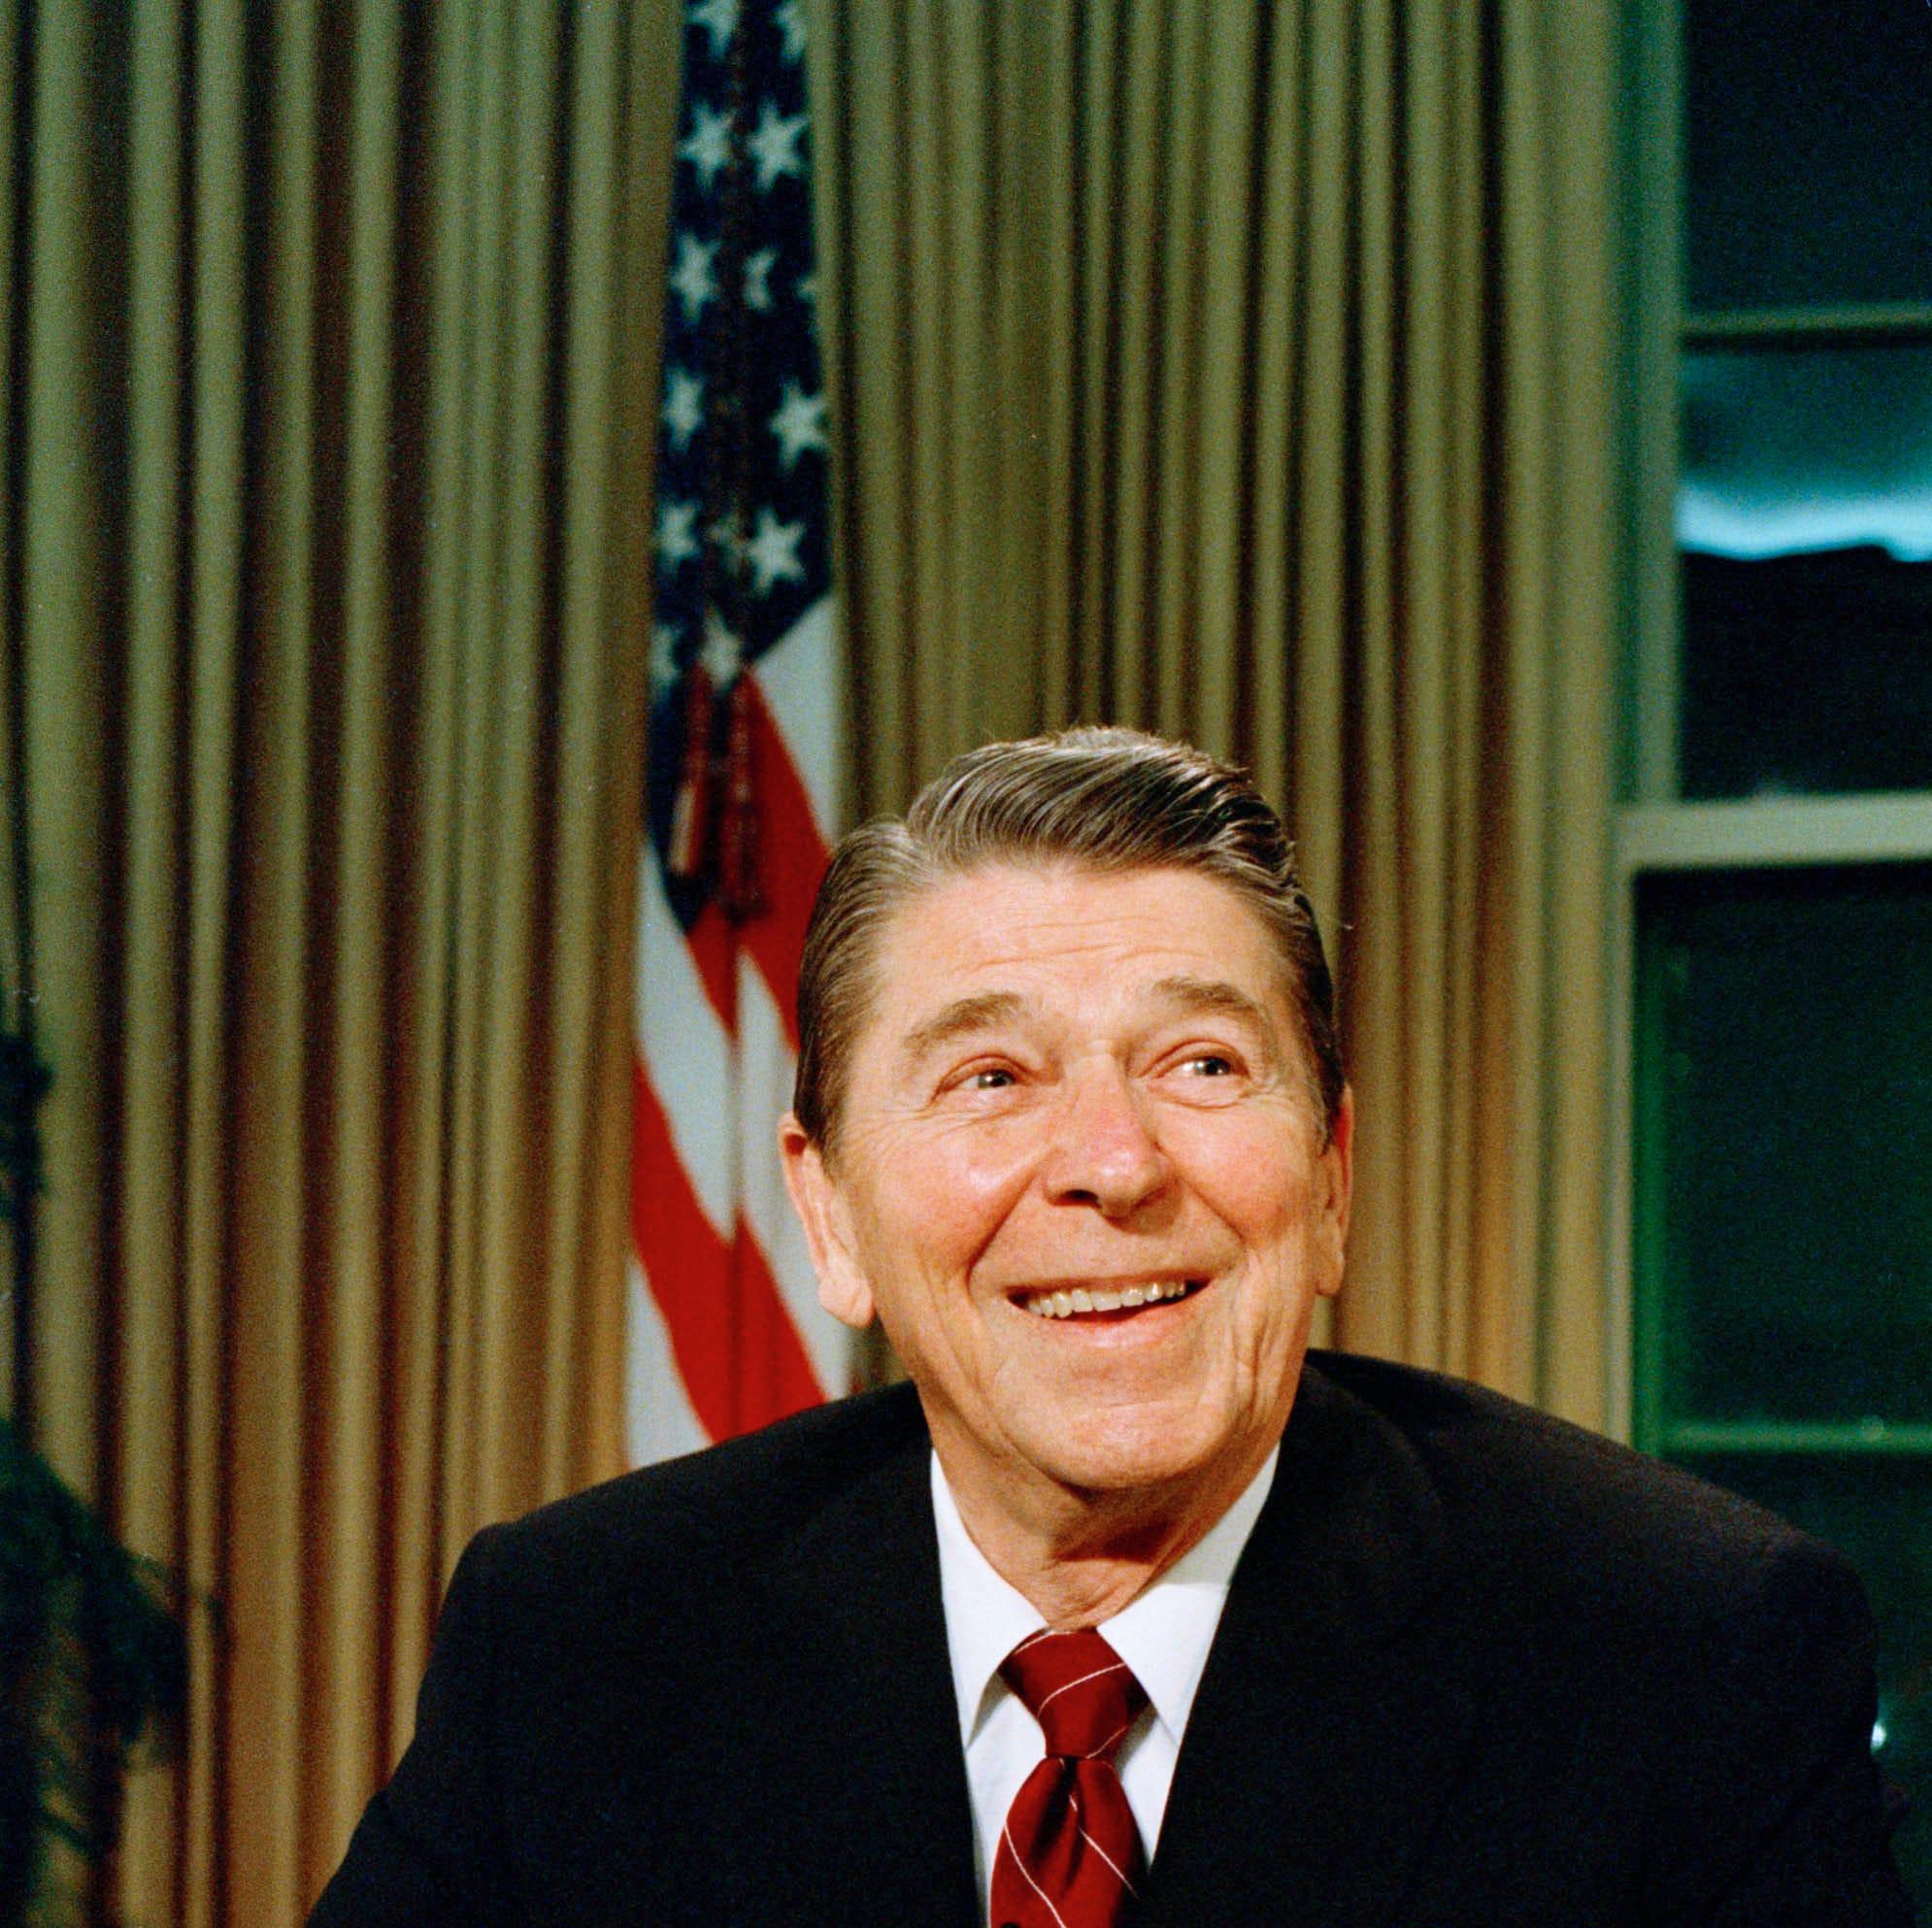 Ronald Reagan on Dec. 11, 1987.